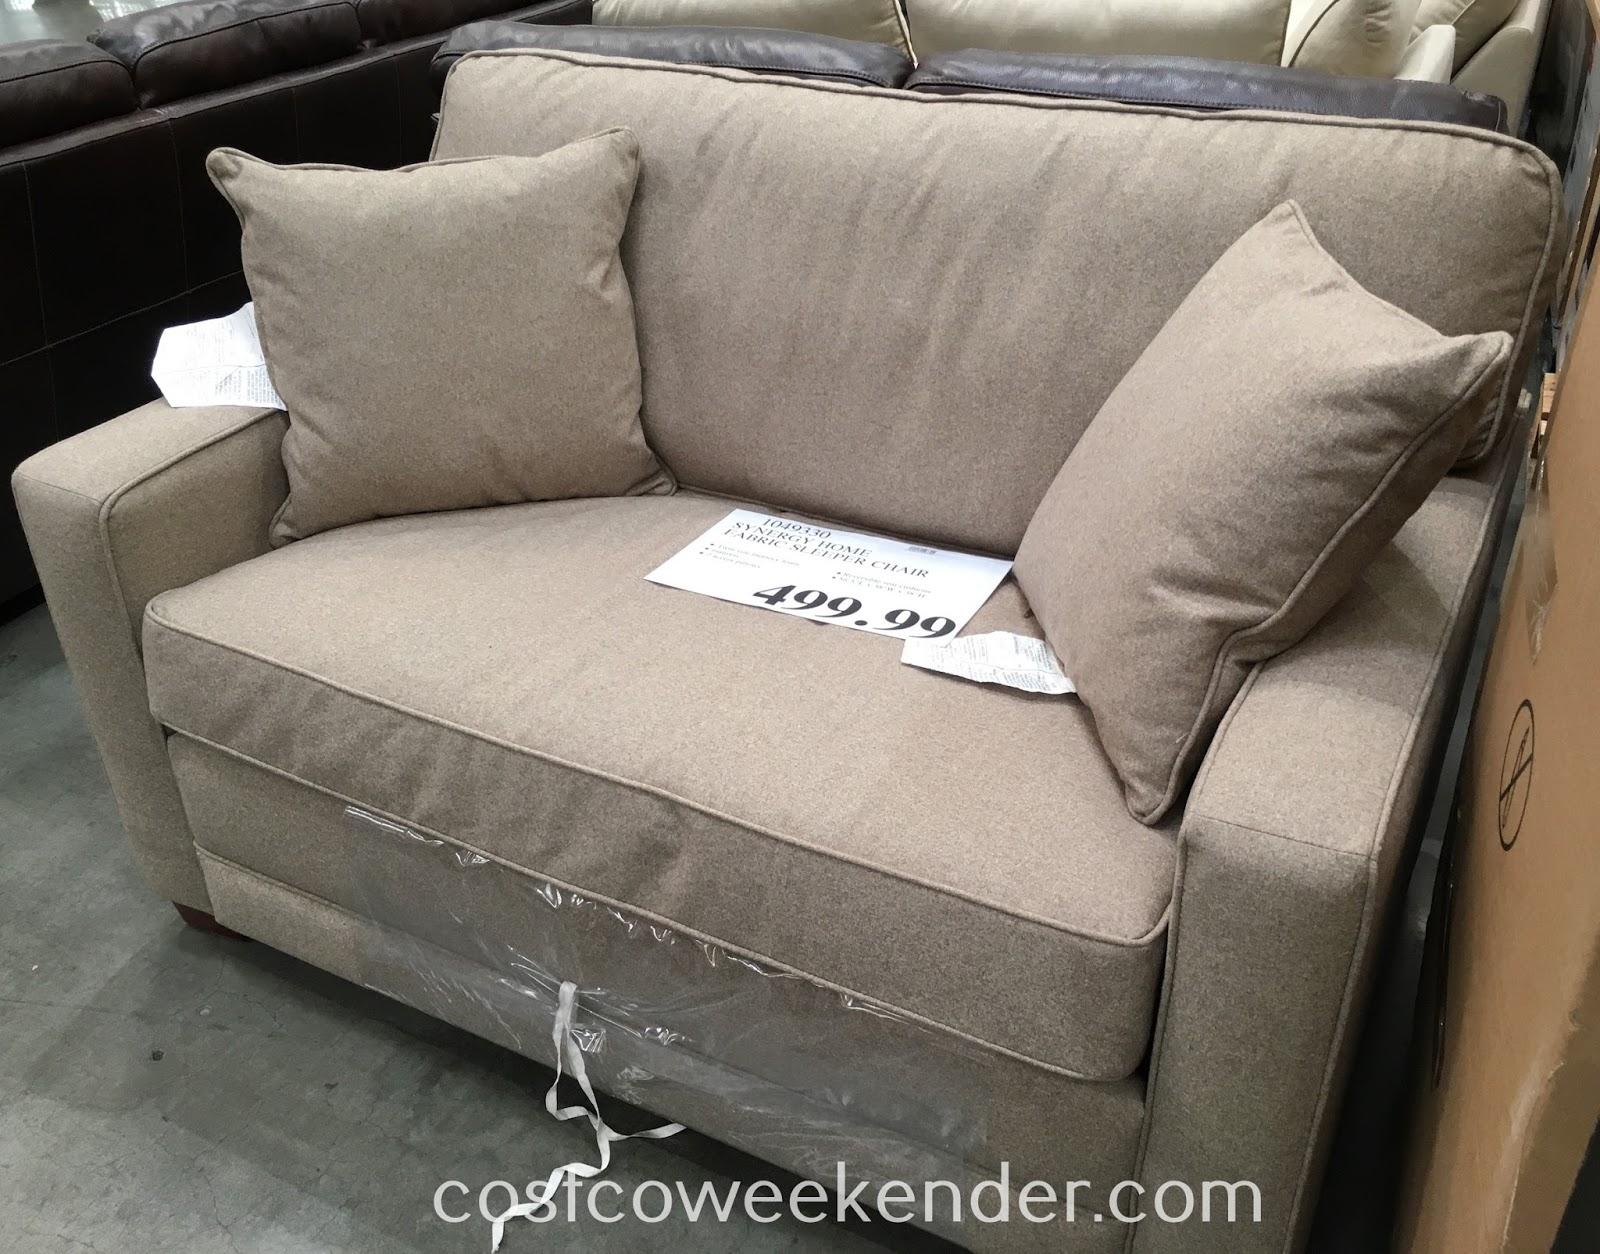 Synergy Home Fabric Sleeper Chair  Costco Weekender